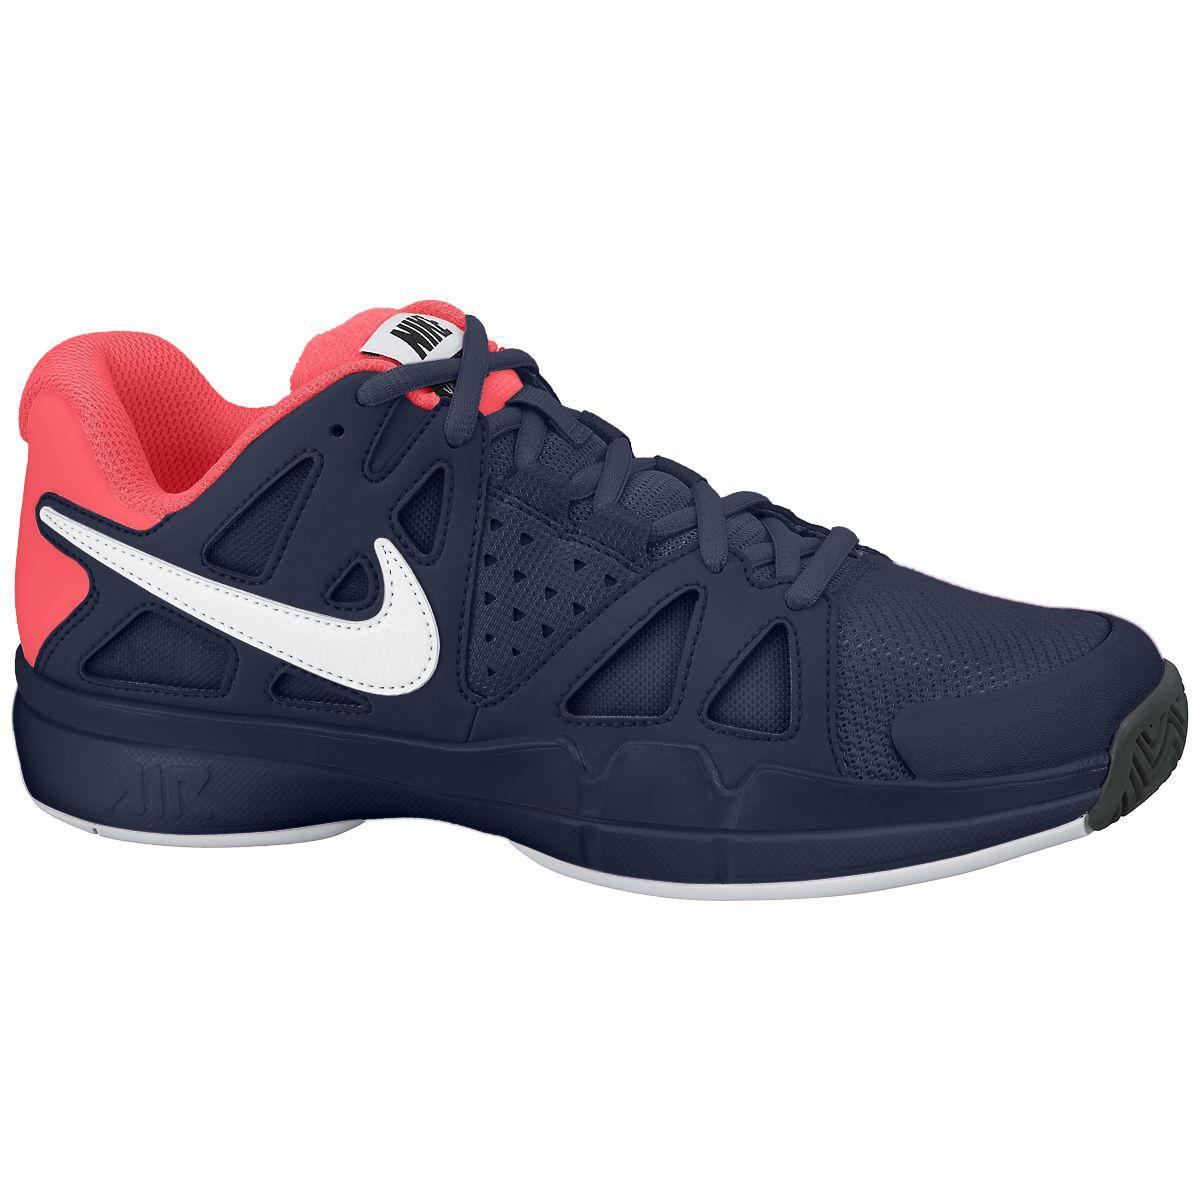 nike tennis shoes hot lava